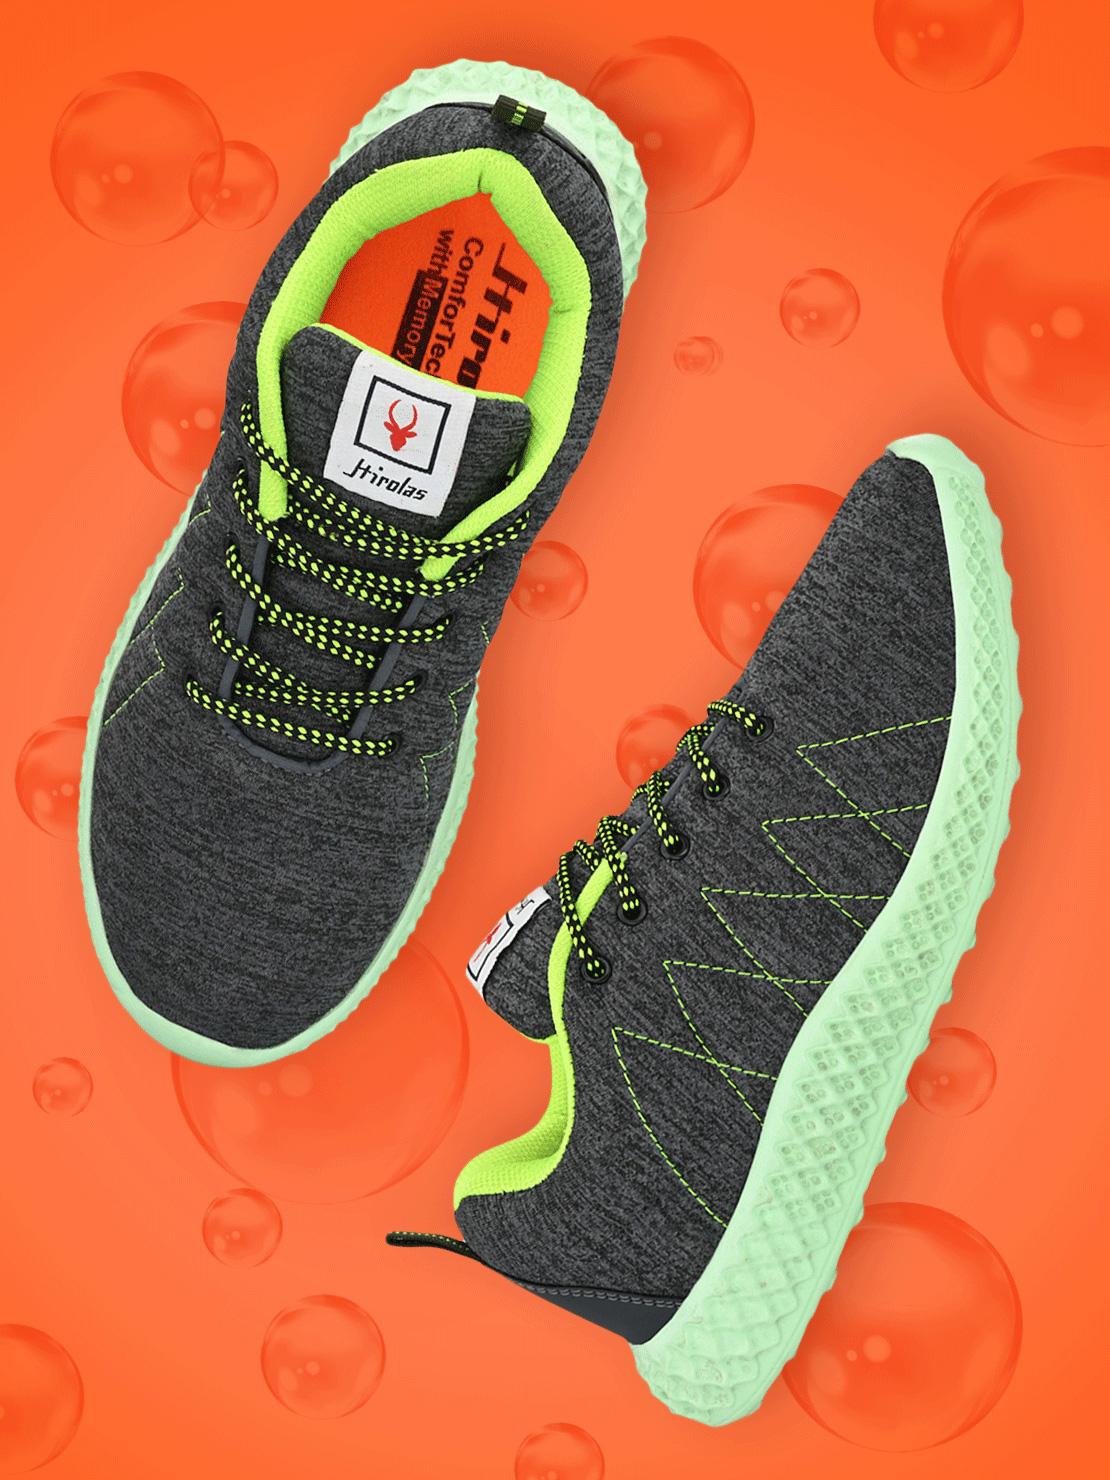 Hirolas | Hirolas® Men's Mesh Grey Running/Walking/Gym/Jogging Sports Sneaker Shoes